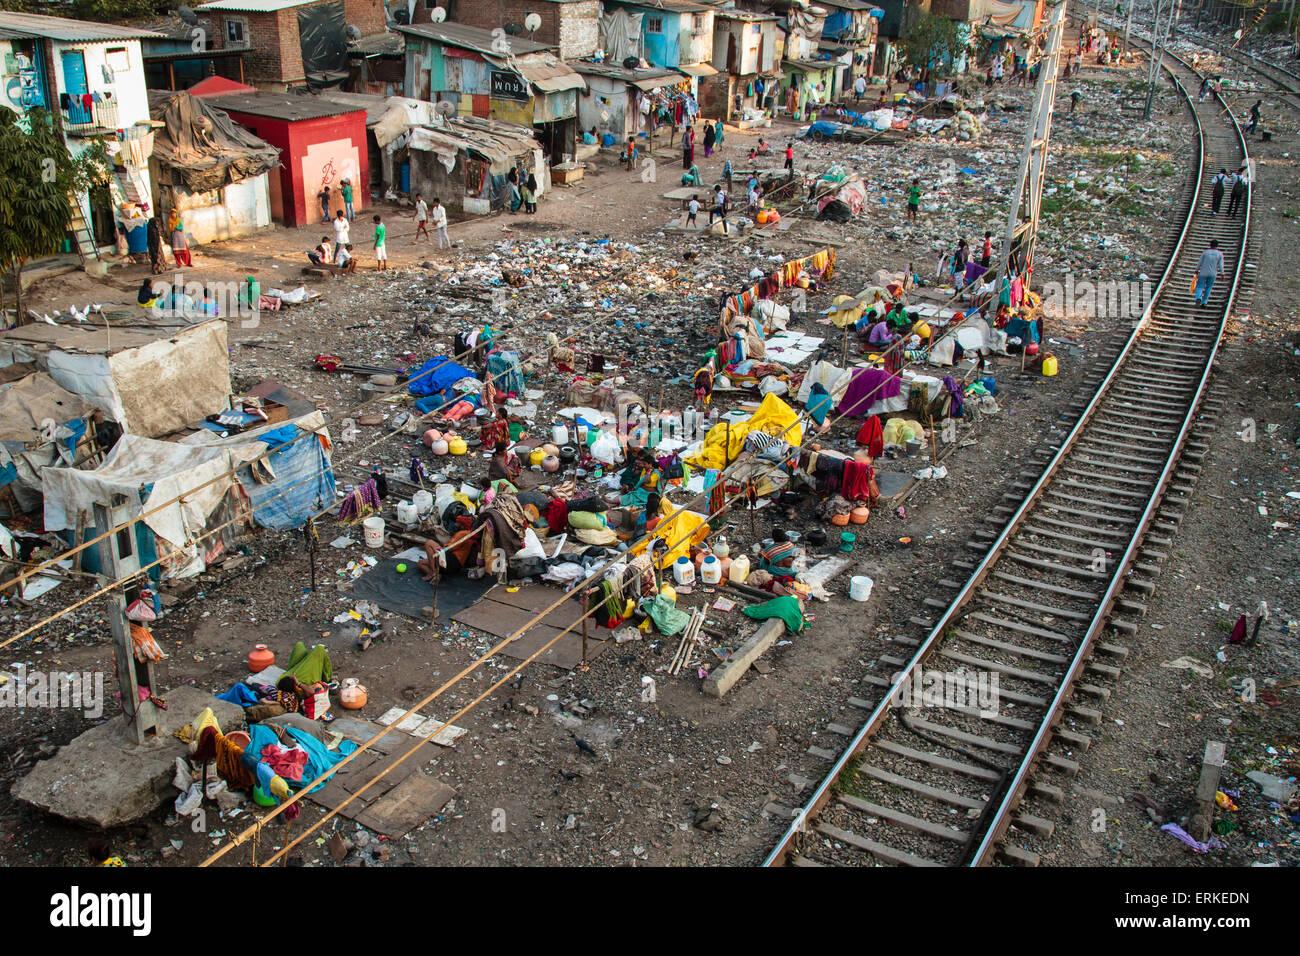 Baraccopoli accanto ai binari ferroviari, vicino a Mumbai, Maharashtra, India Immagini Stock